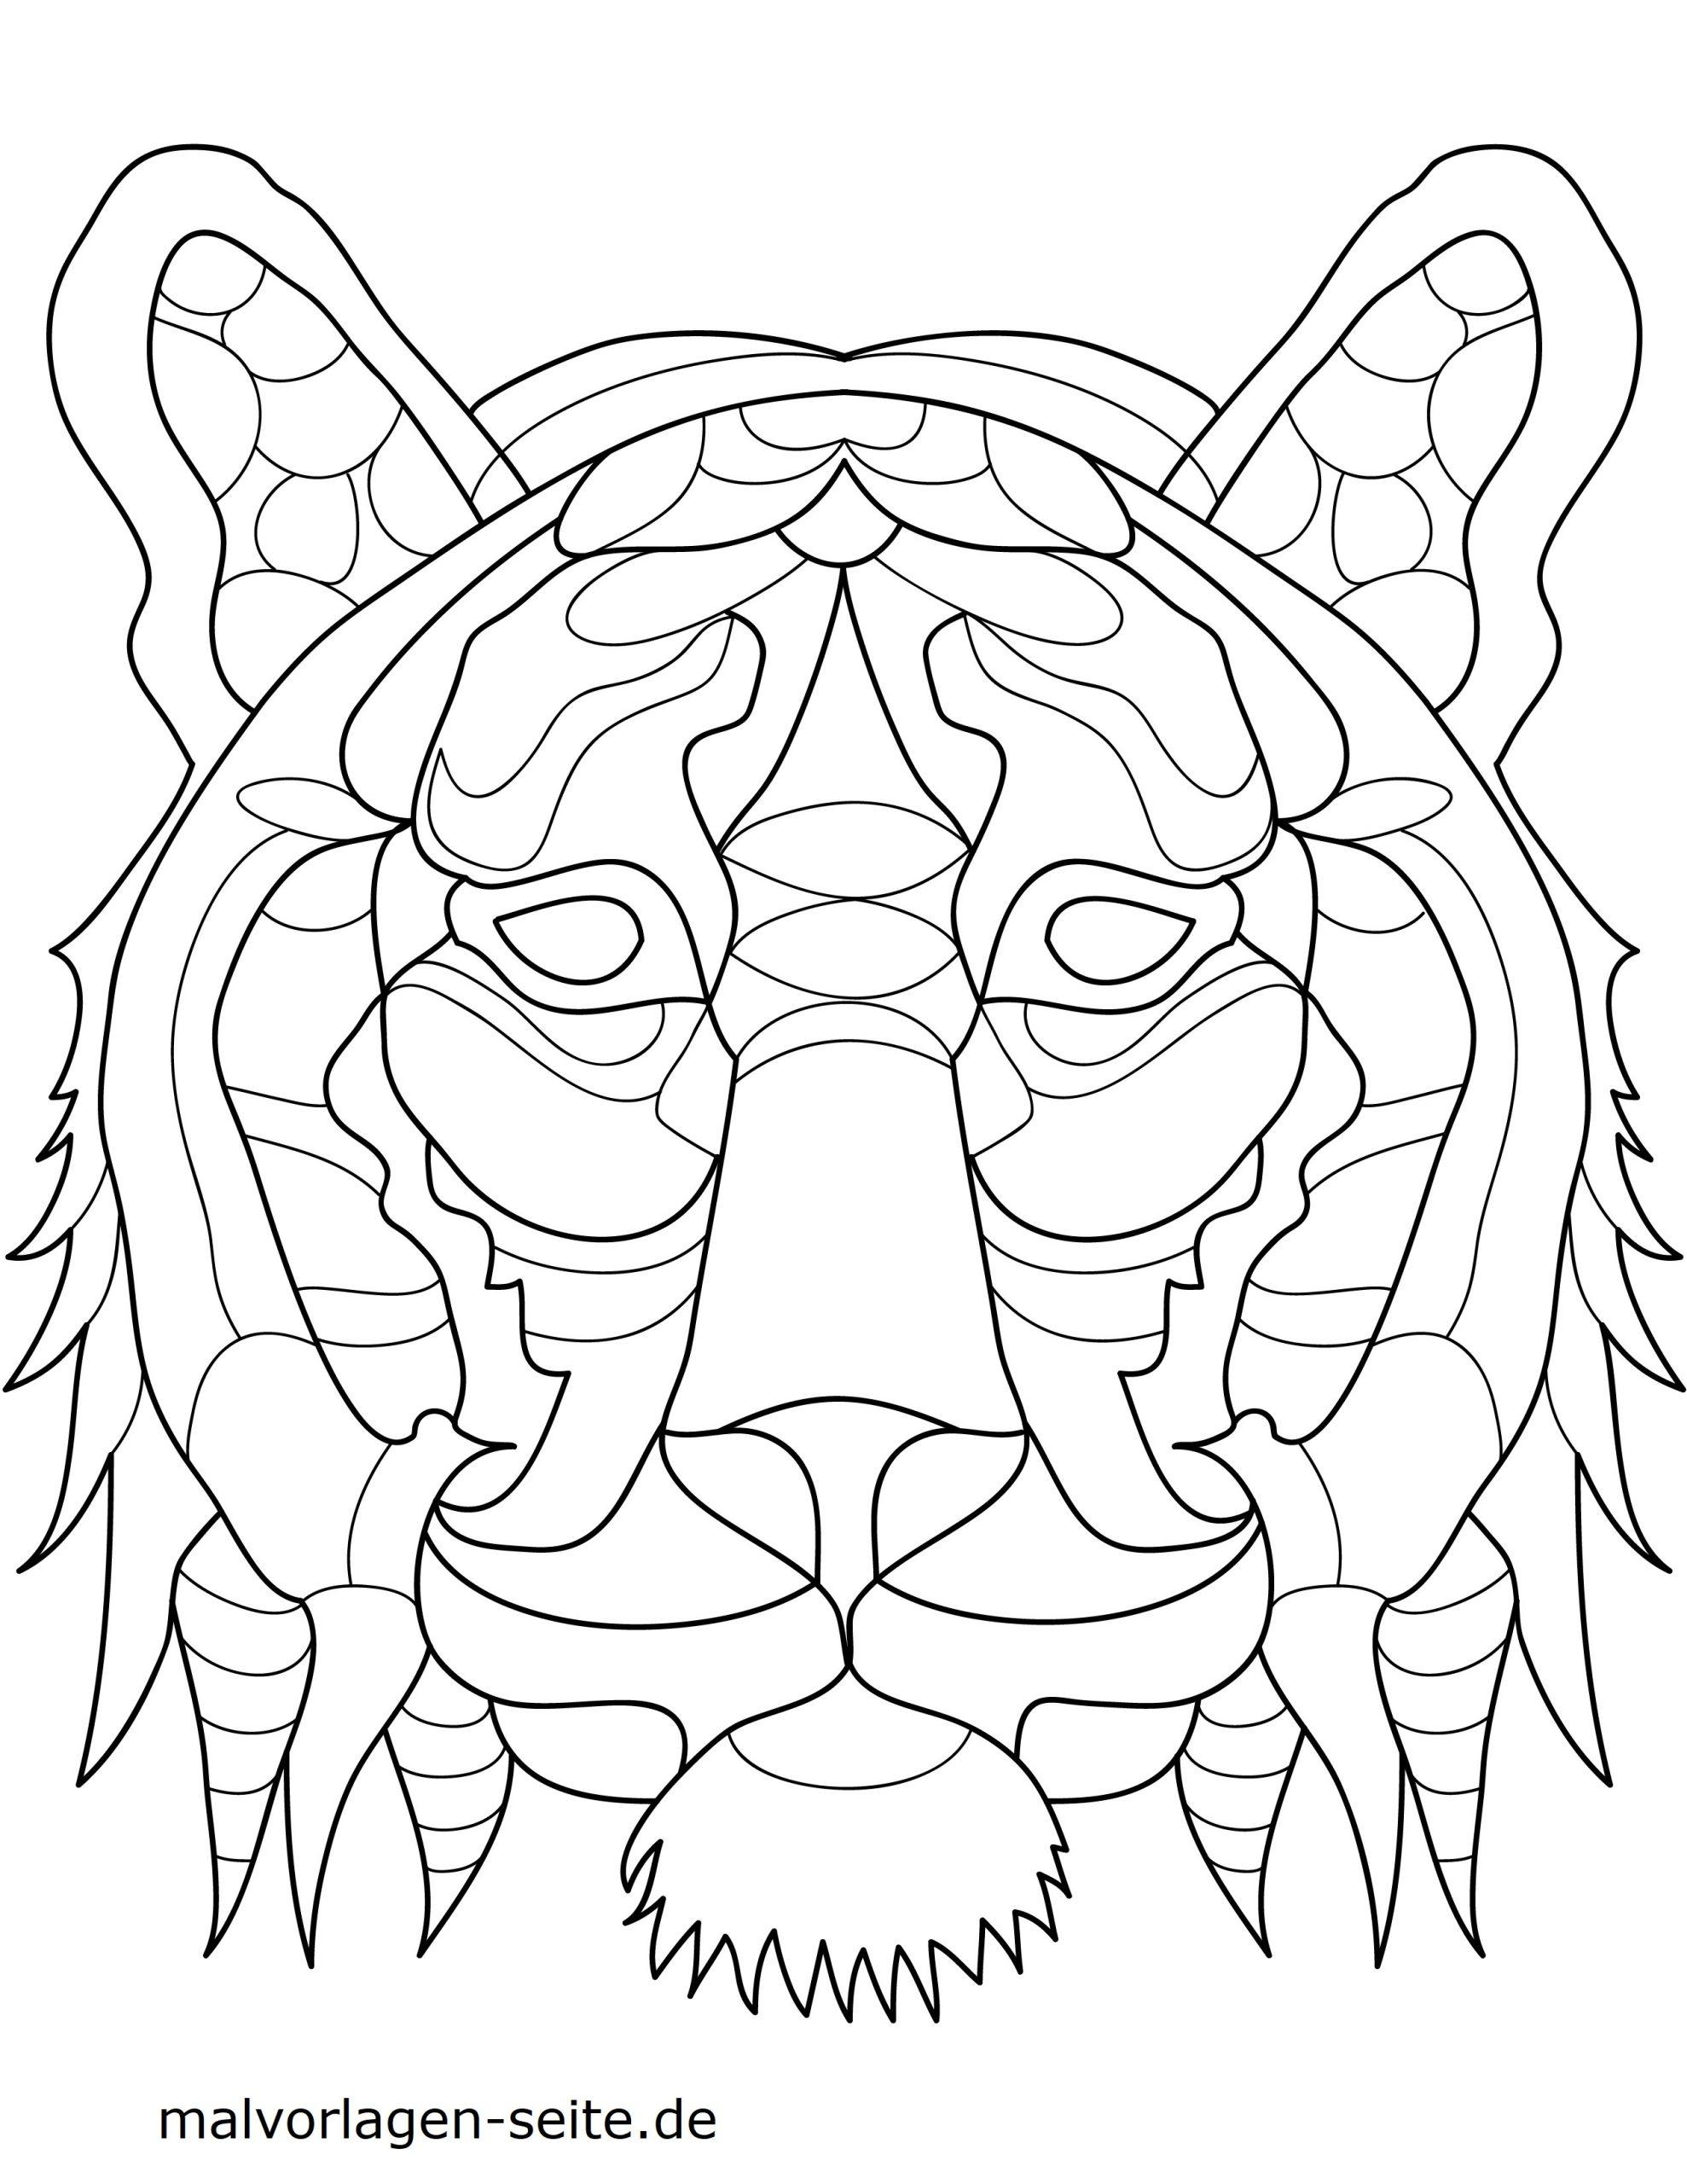 Malvorlage Tiermandala Tiger | Tiere Mandalas - Ausmalbilder ganzes Tier Mandalas